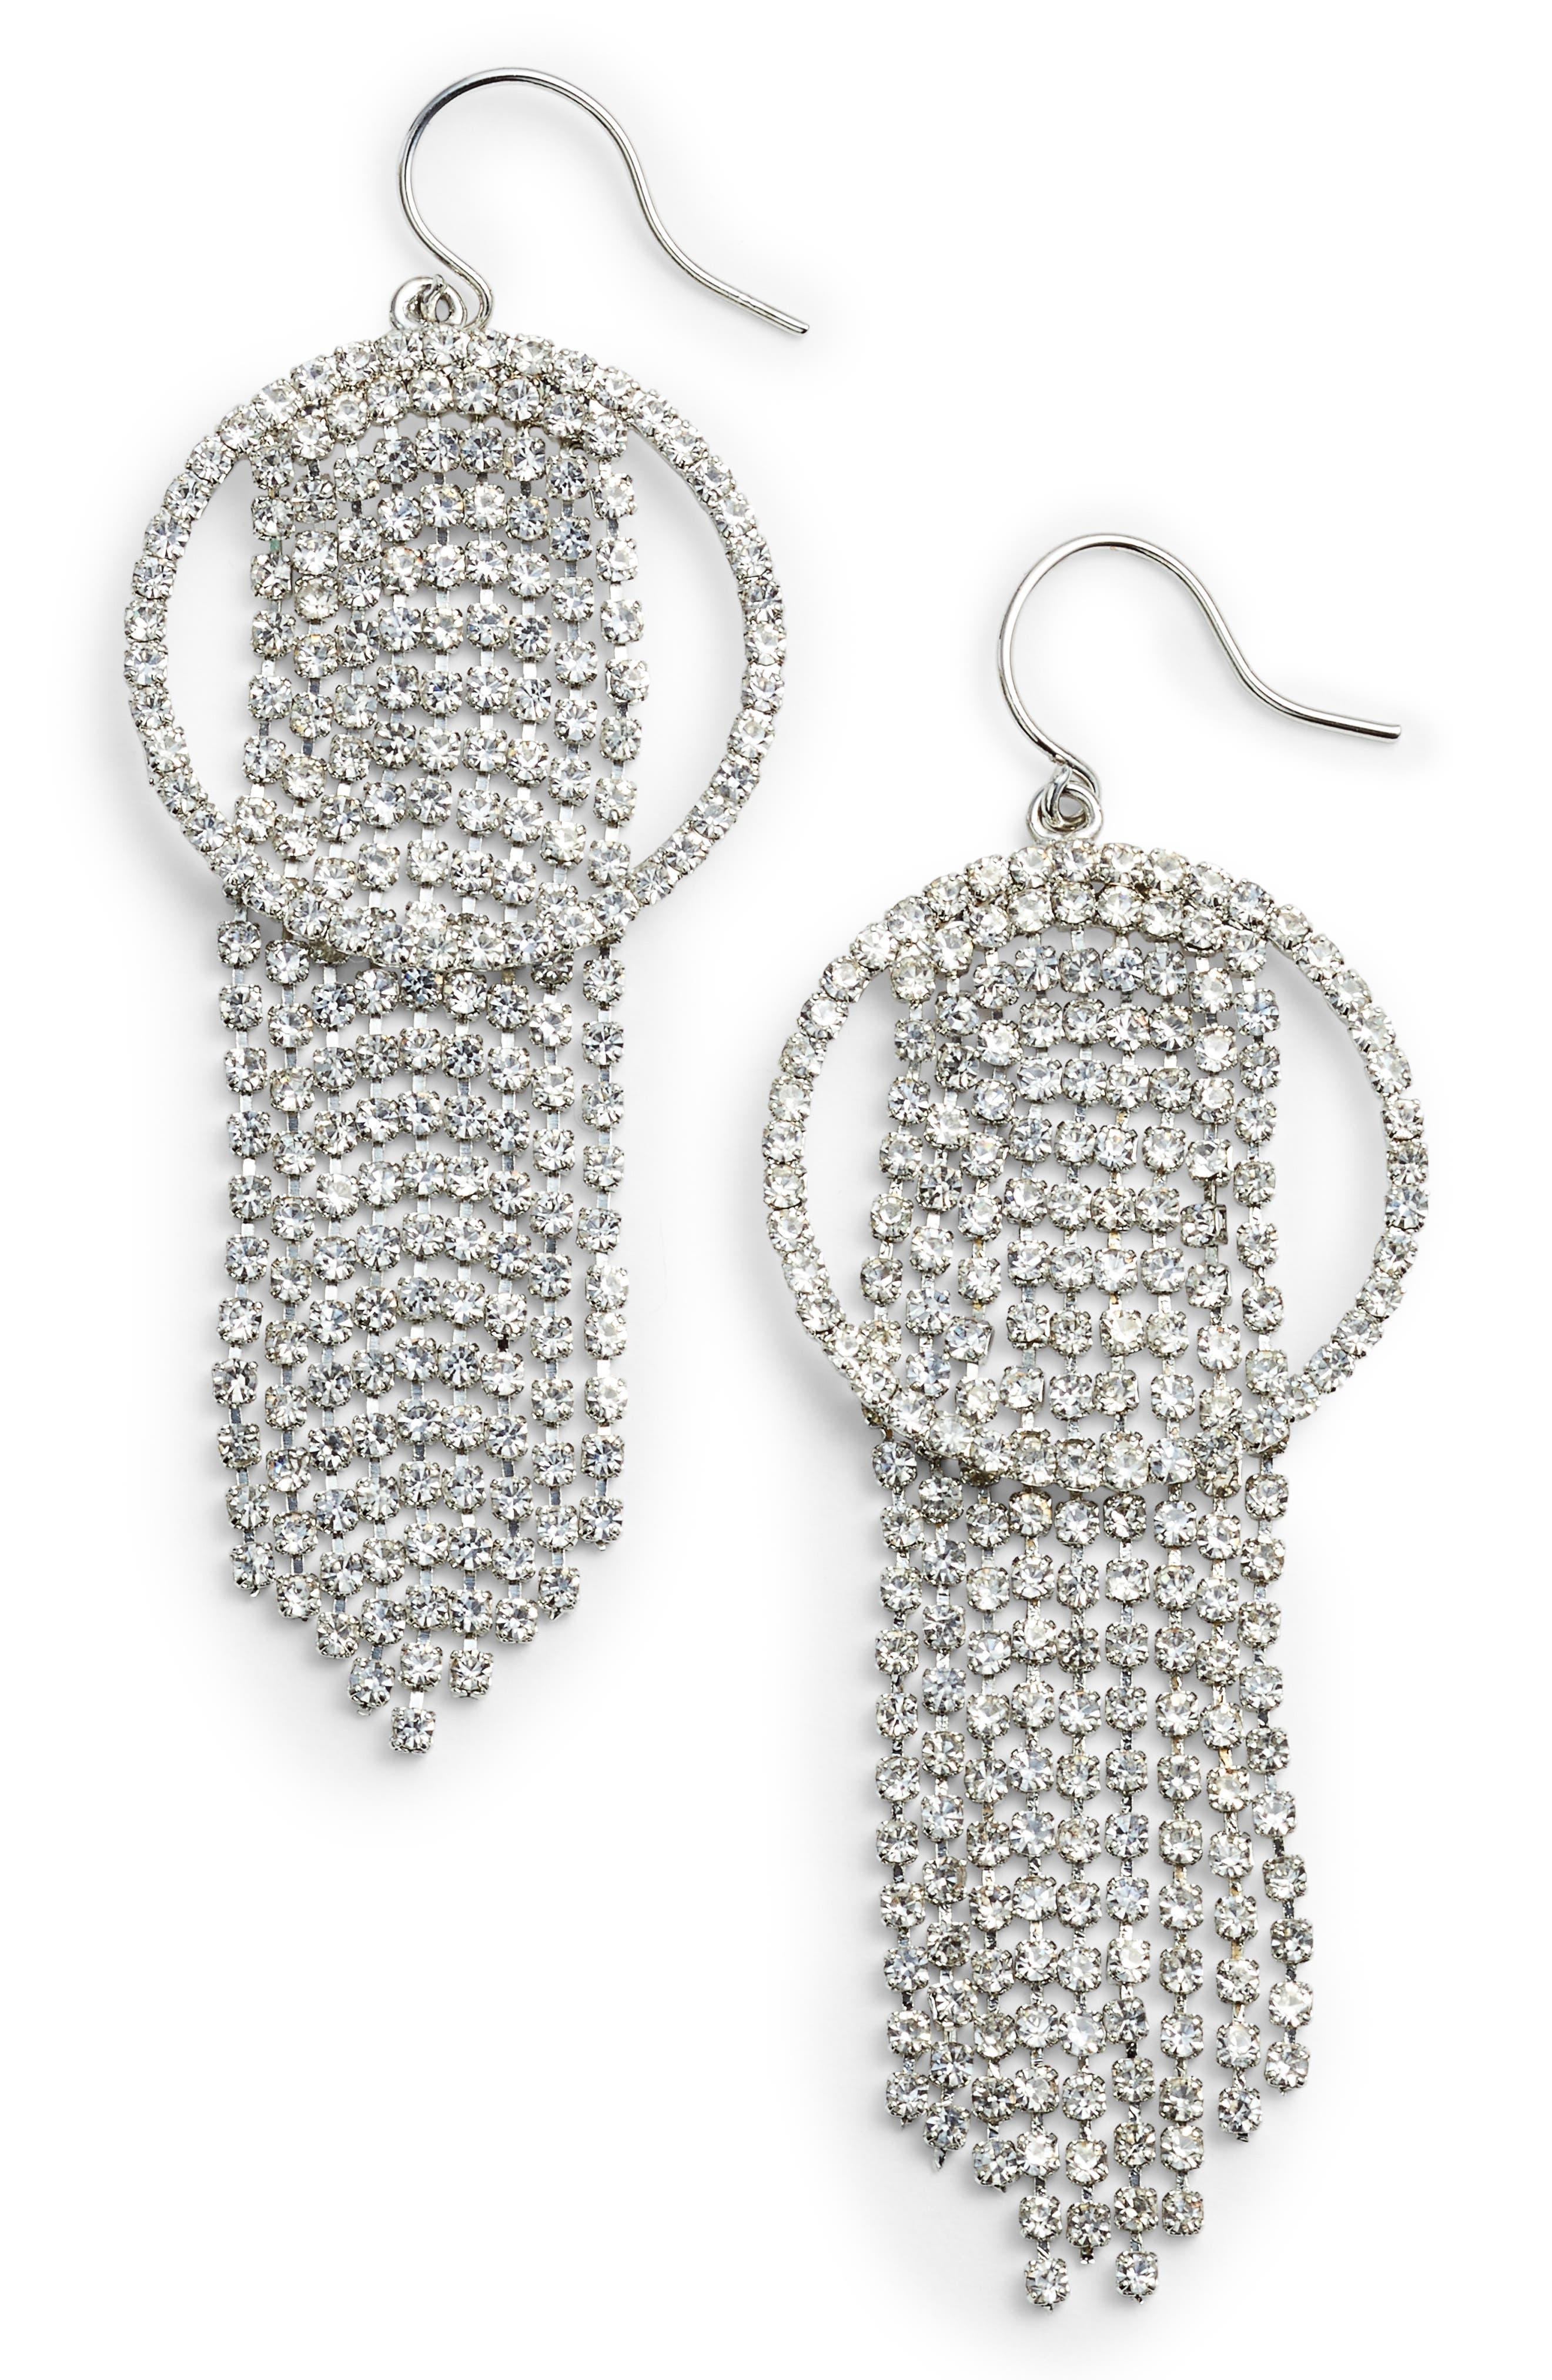 Frontal Hoop Crystal Fringe Drop Earrings,                             Main thumbnail 1, color,                             040